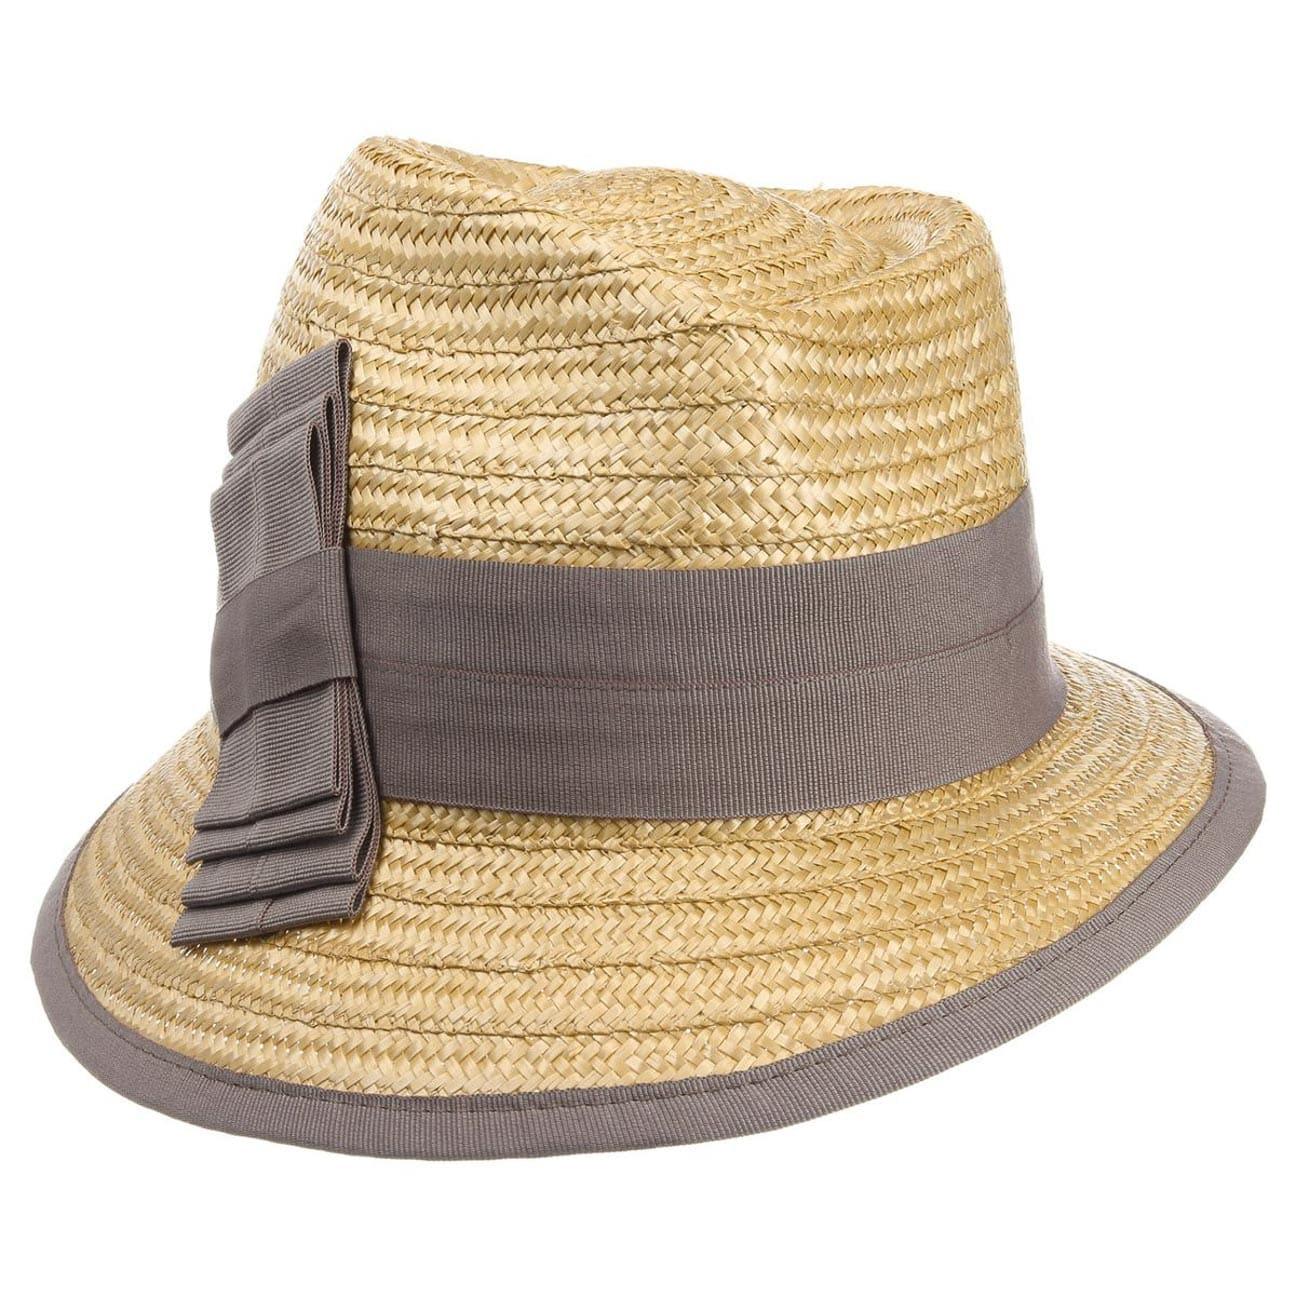 Sombrero Asim?trico de Paja by bedacht  trilby de paja